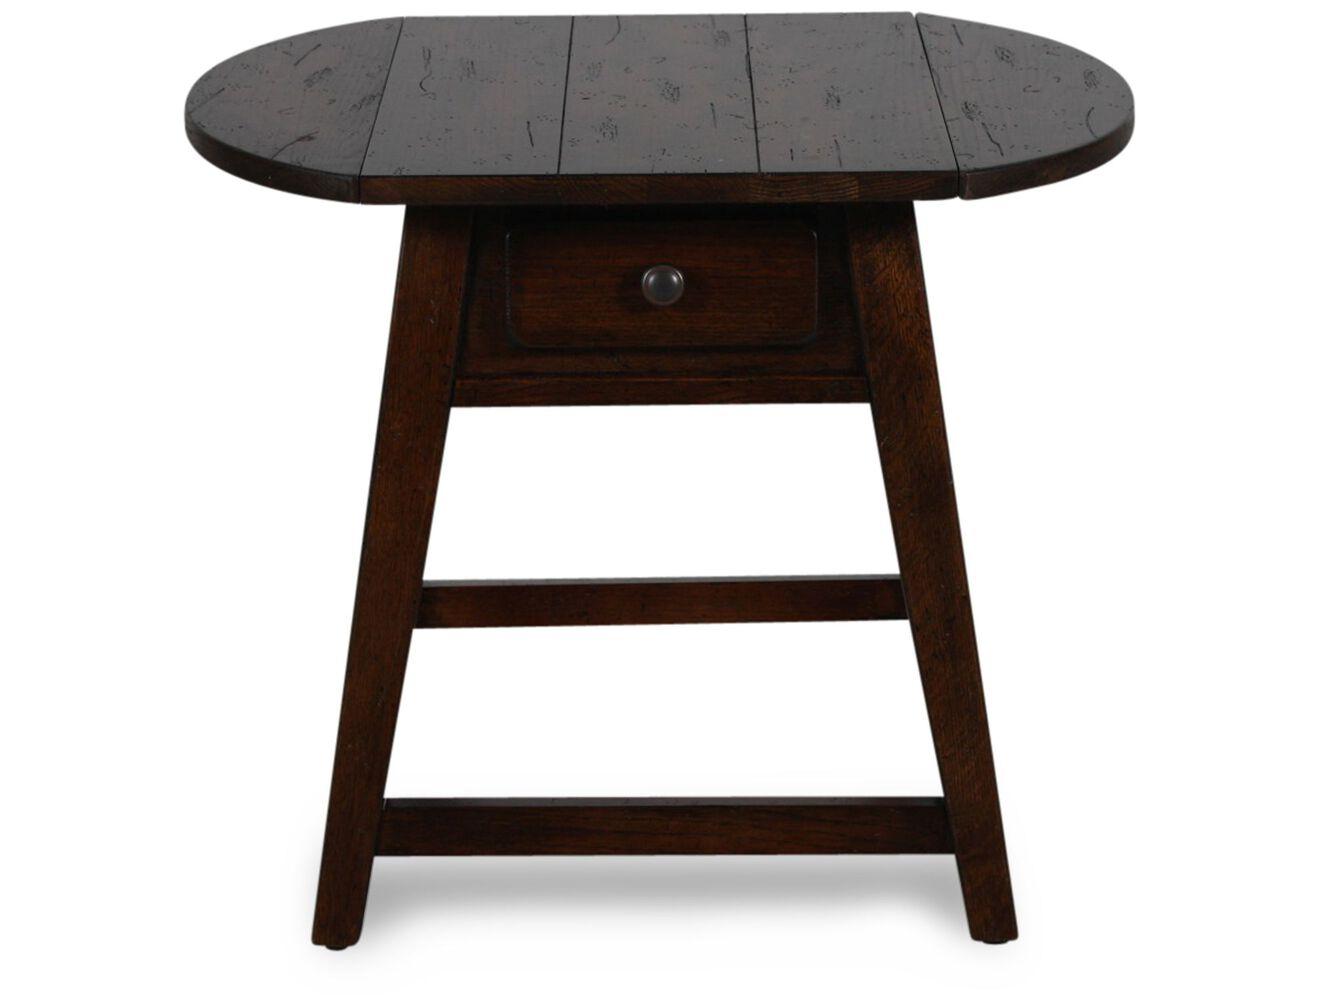 Broyhill Attic Heirloom Dining Table Broyhill Attic Heirlooms Rustic Splay Leg End Table Mathis